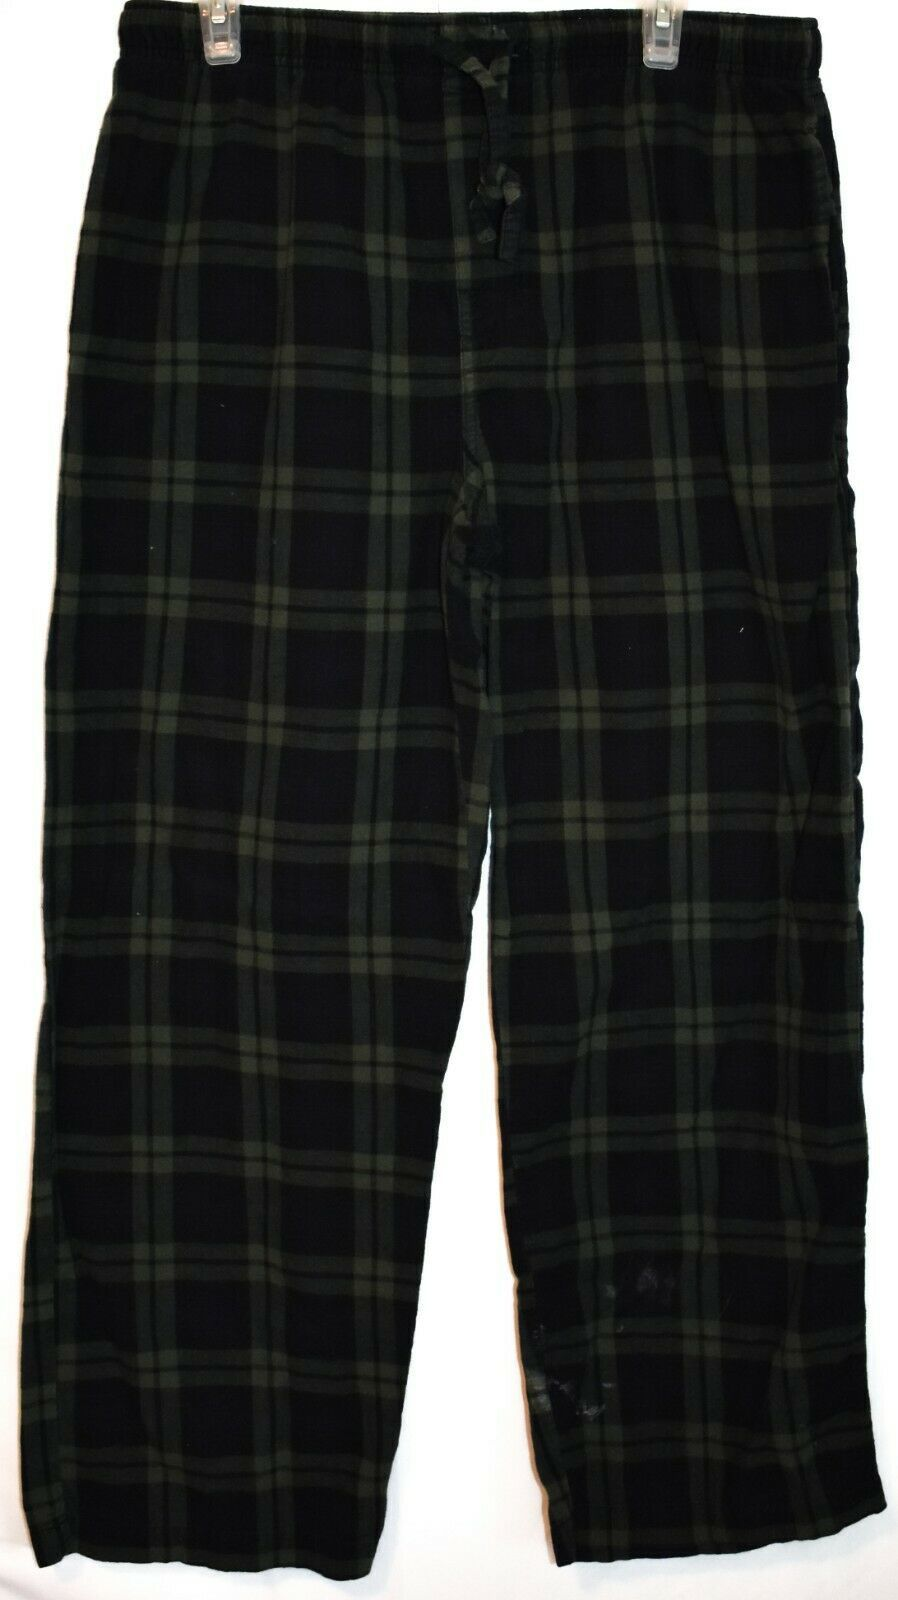 Merona Blue Green Plaid Pajama Lounge Sleepwear PJ Pants Men's Size L 36-38